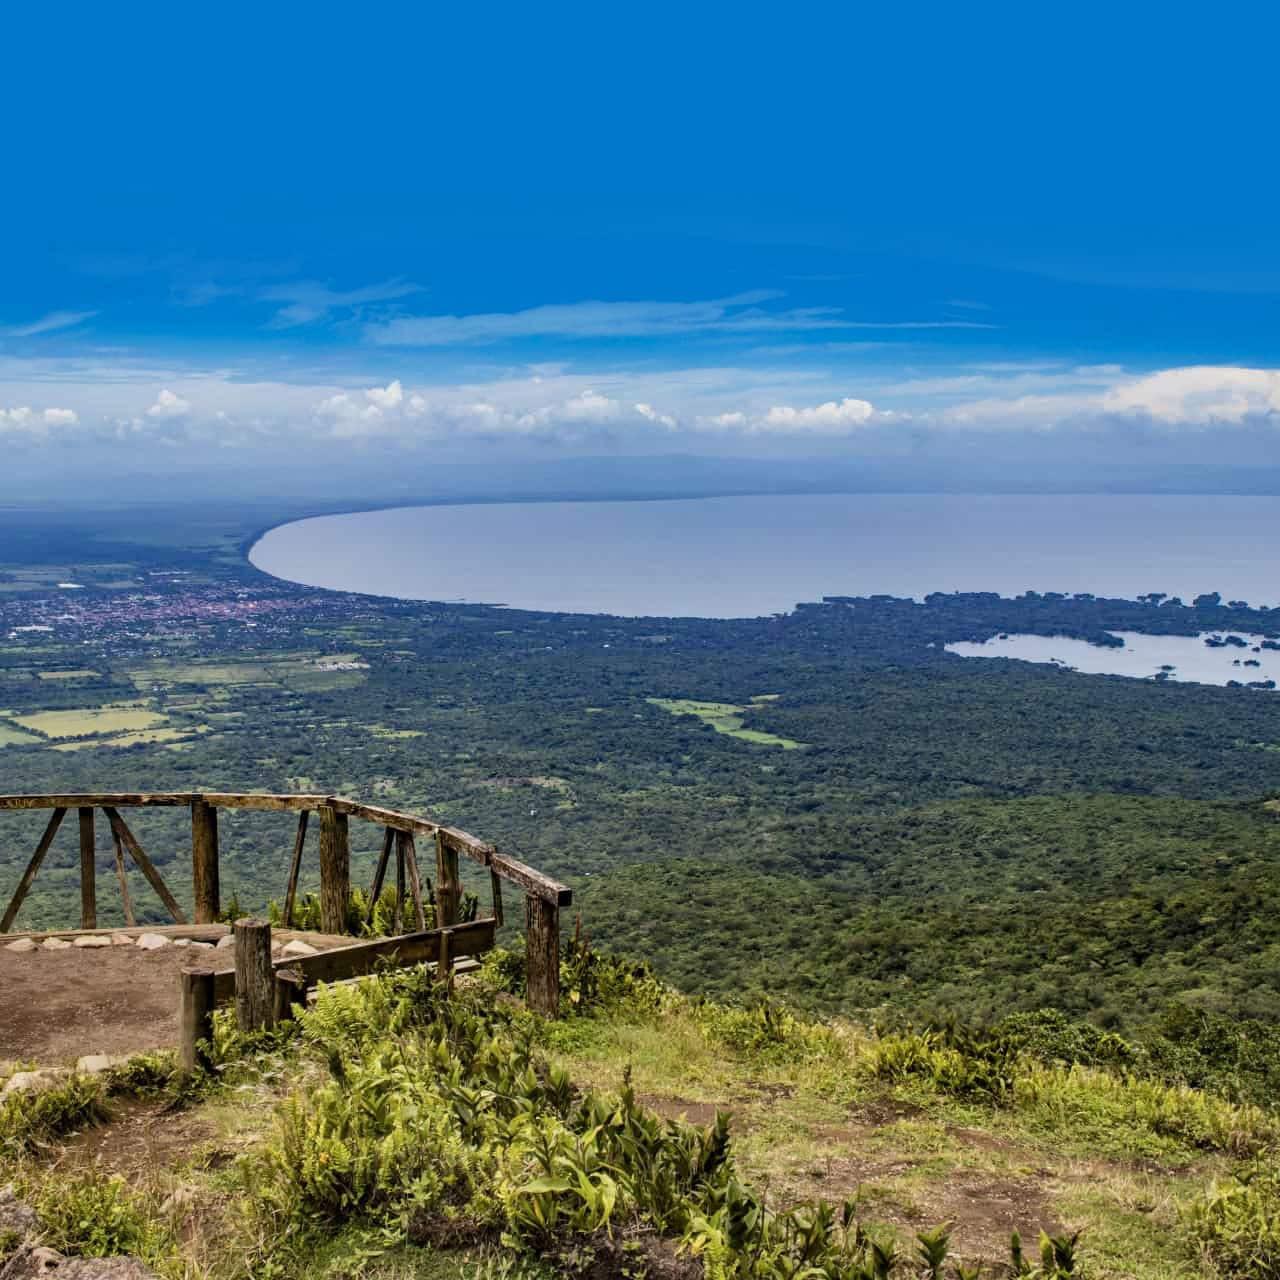 Nicaragua lake central america travel guide